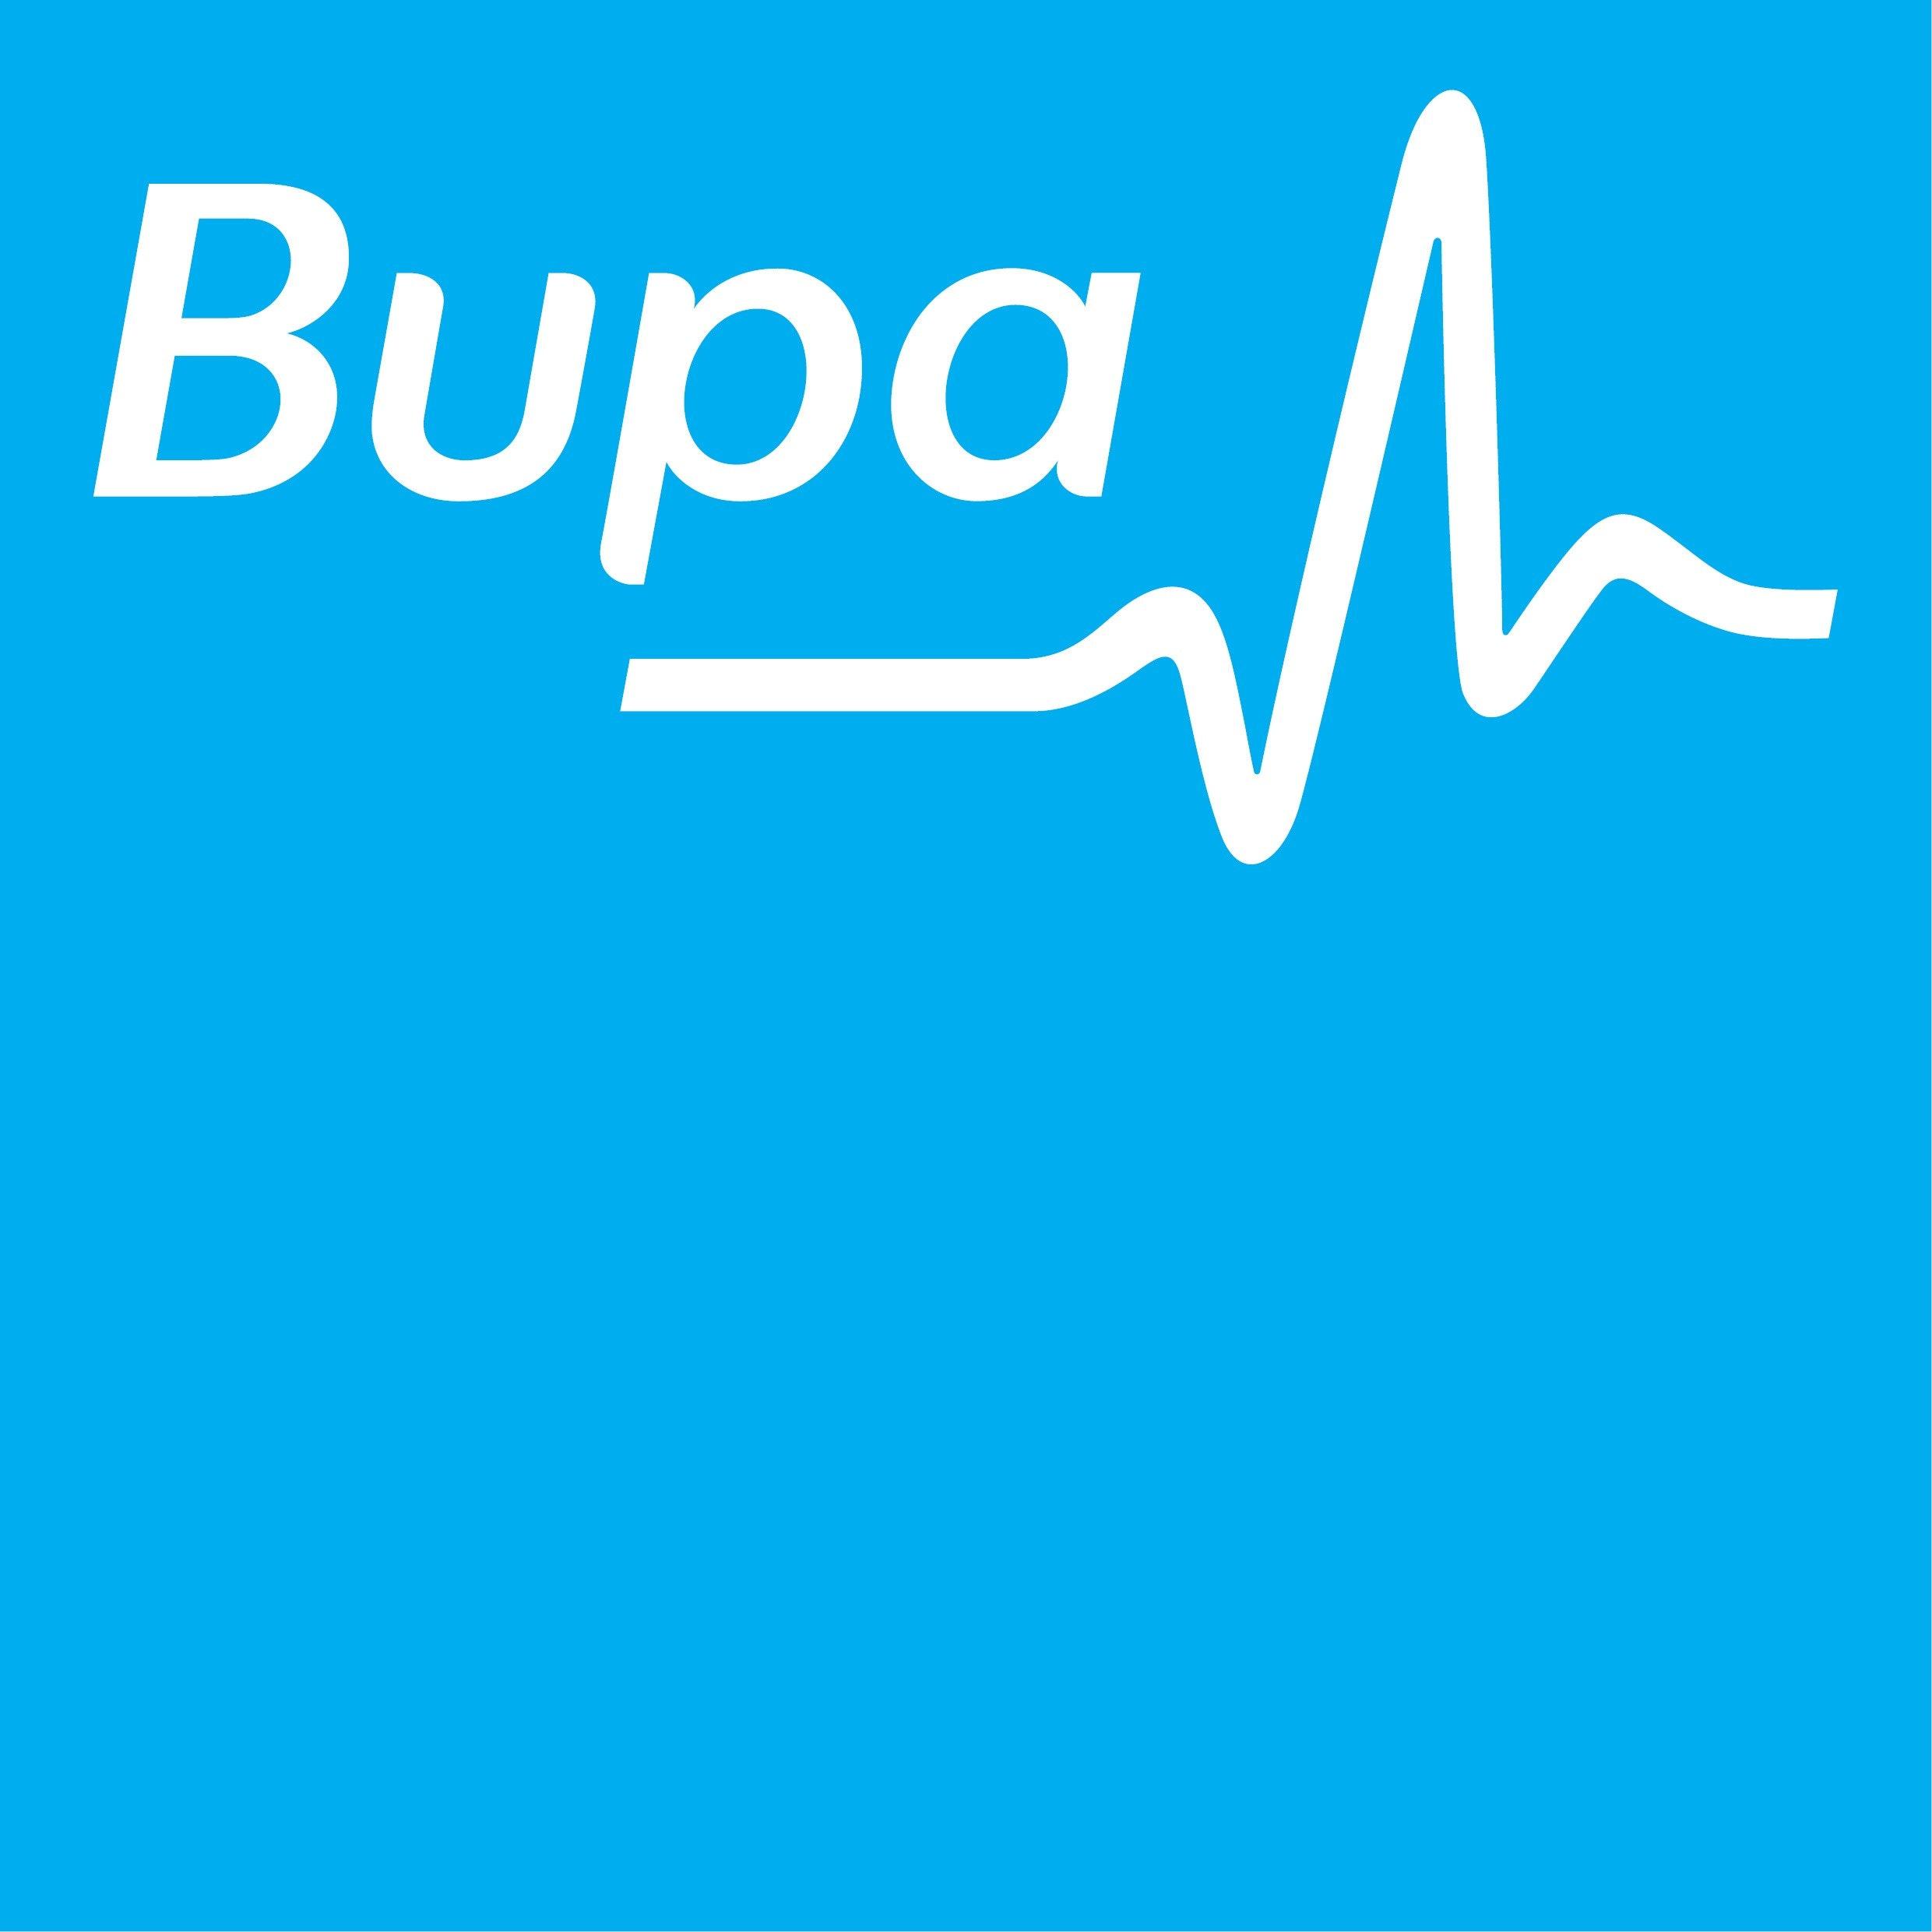 Bupa Bexley logo